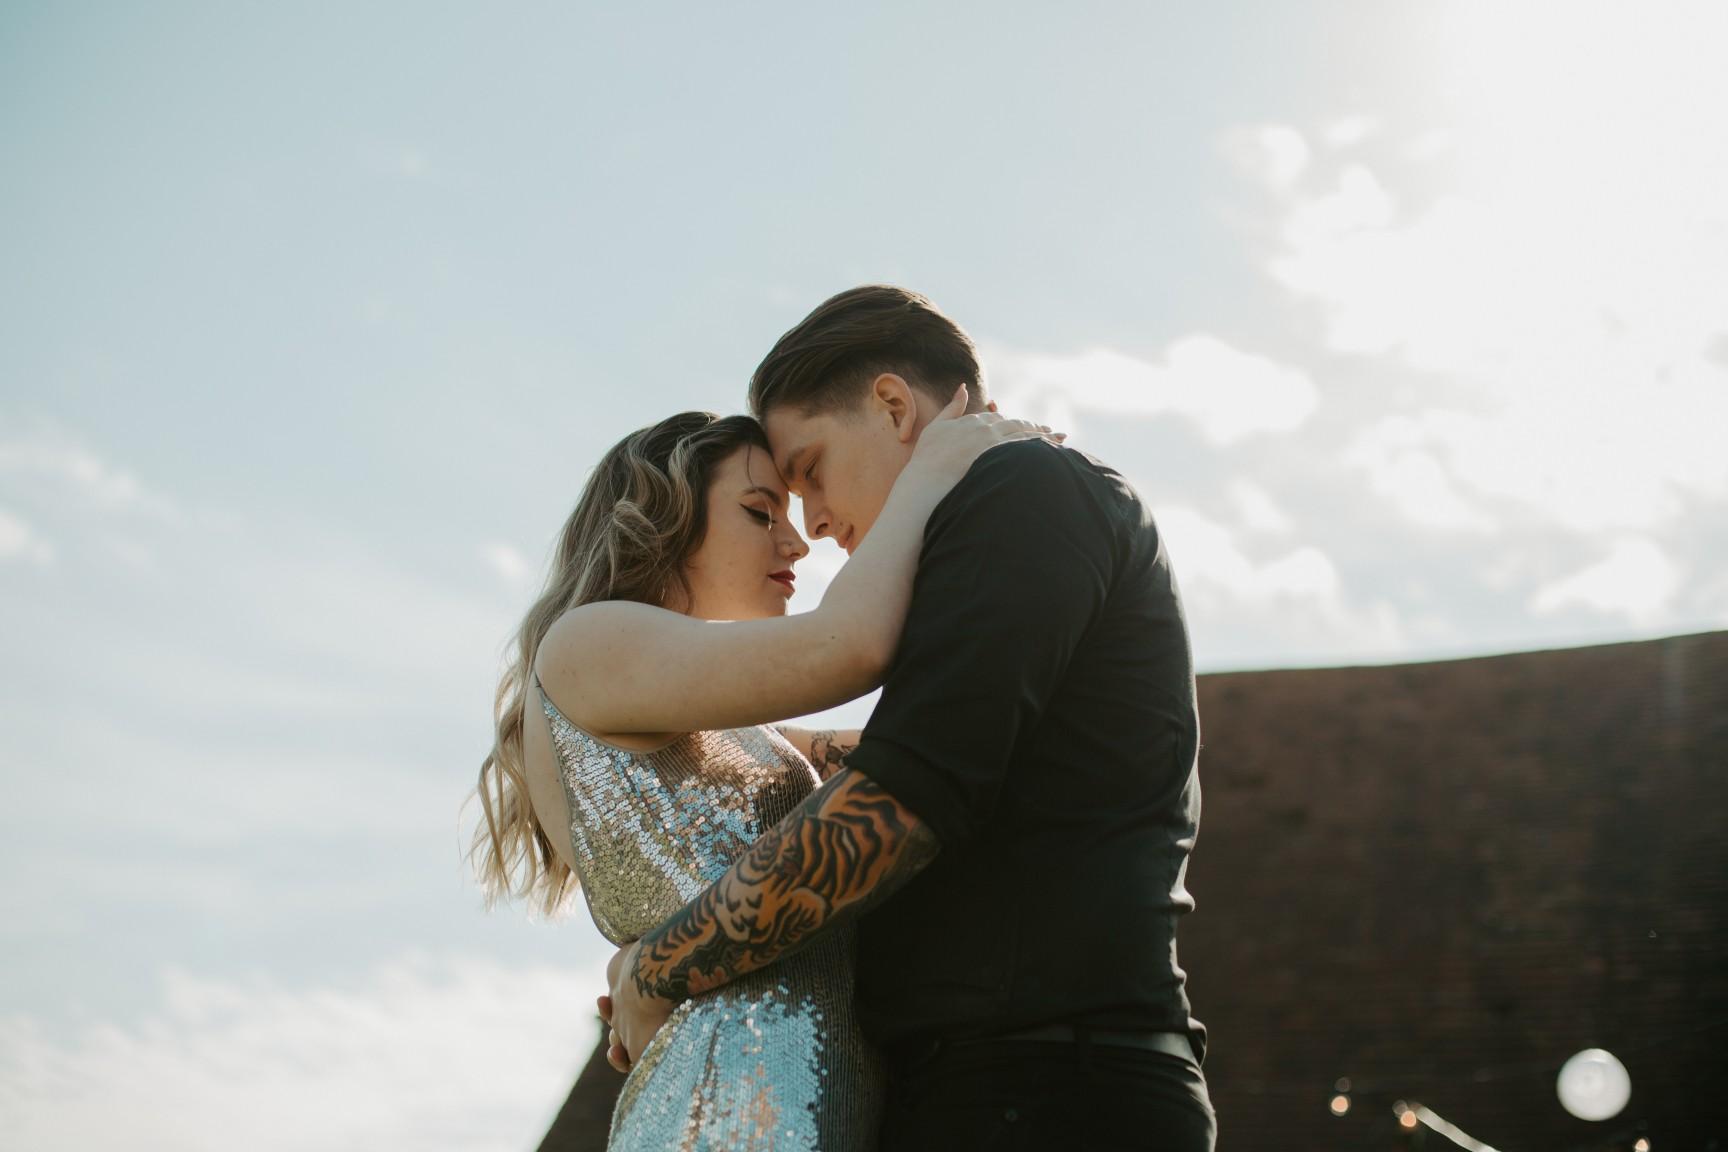 rock and roll wedding - edgy wedding inspiration - sparkly wedding dress - unconventional wedding